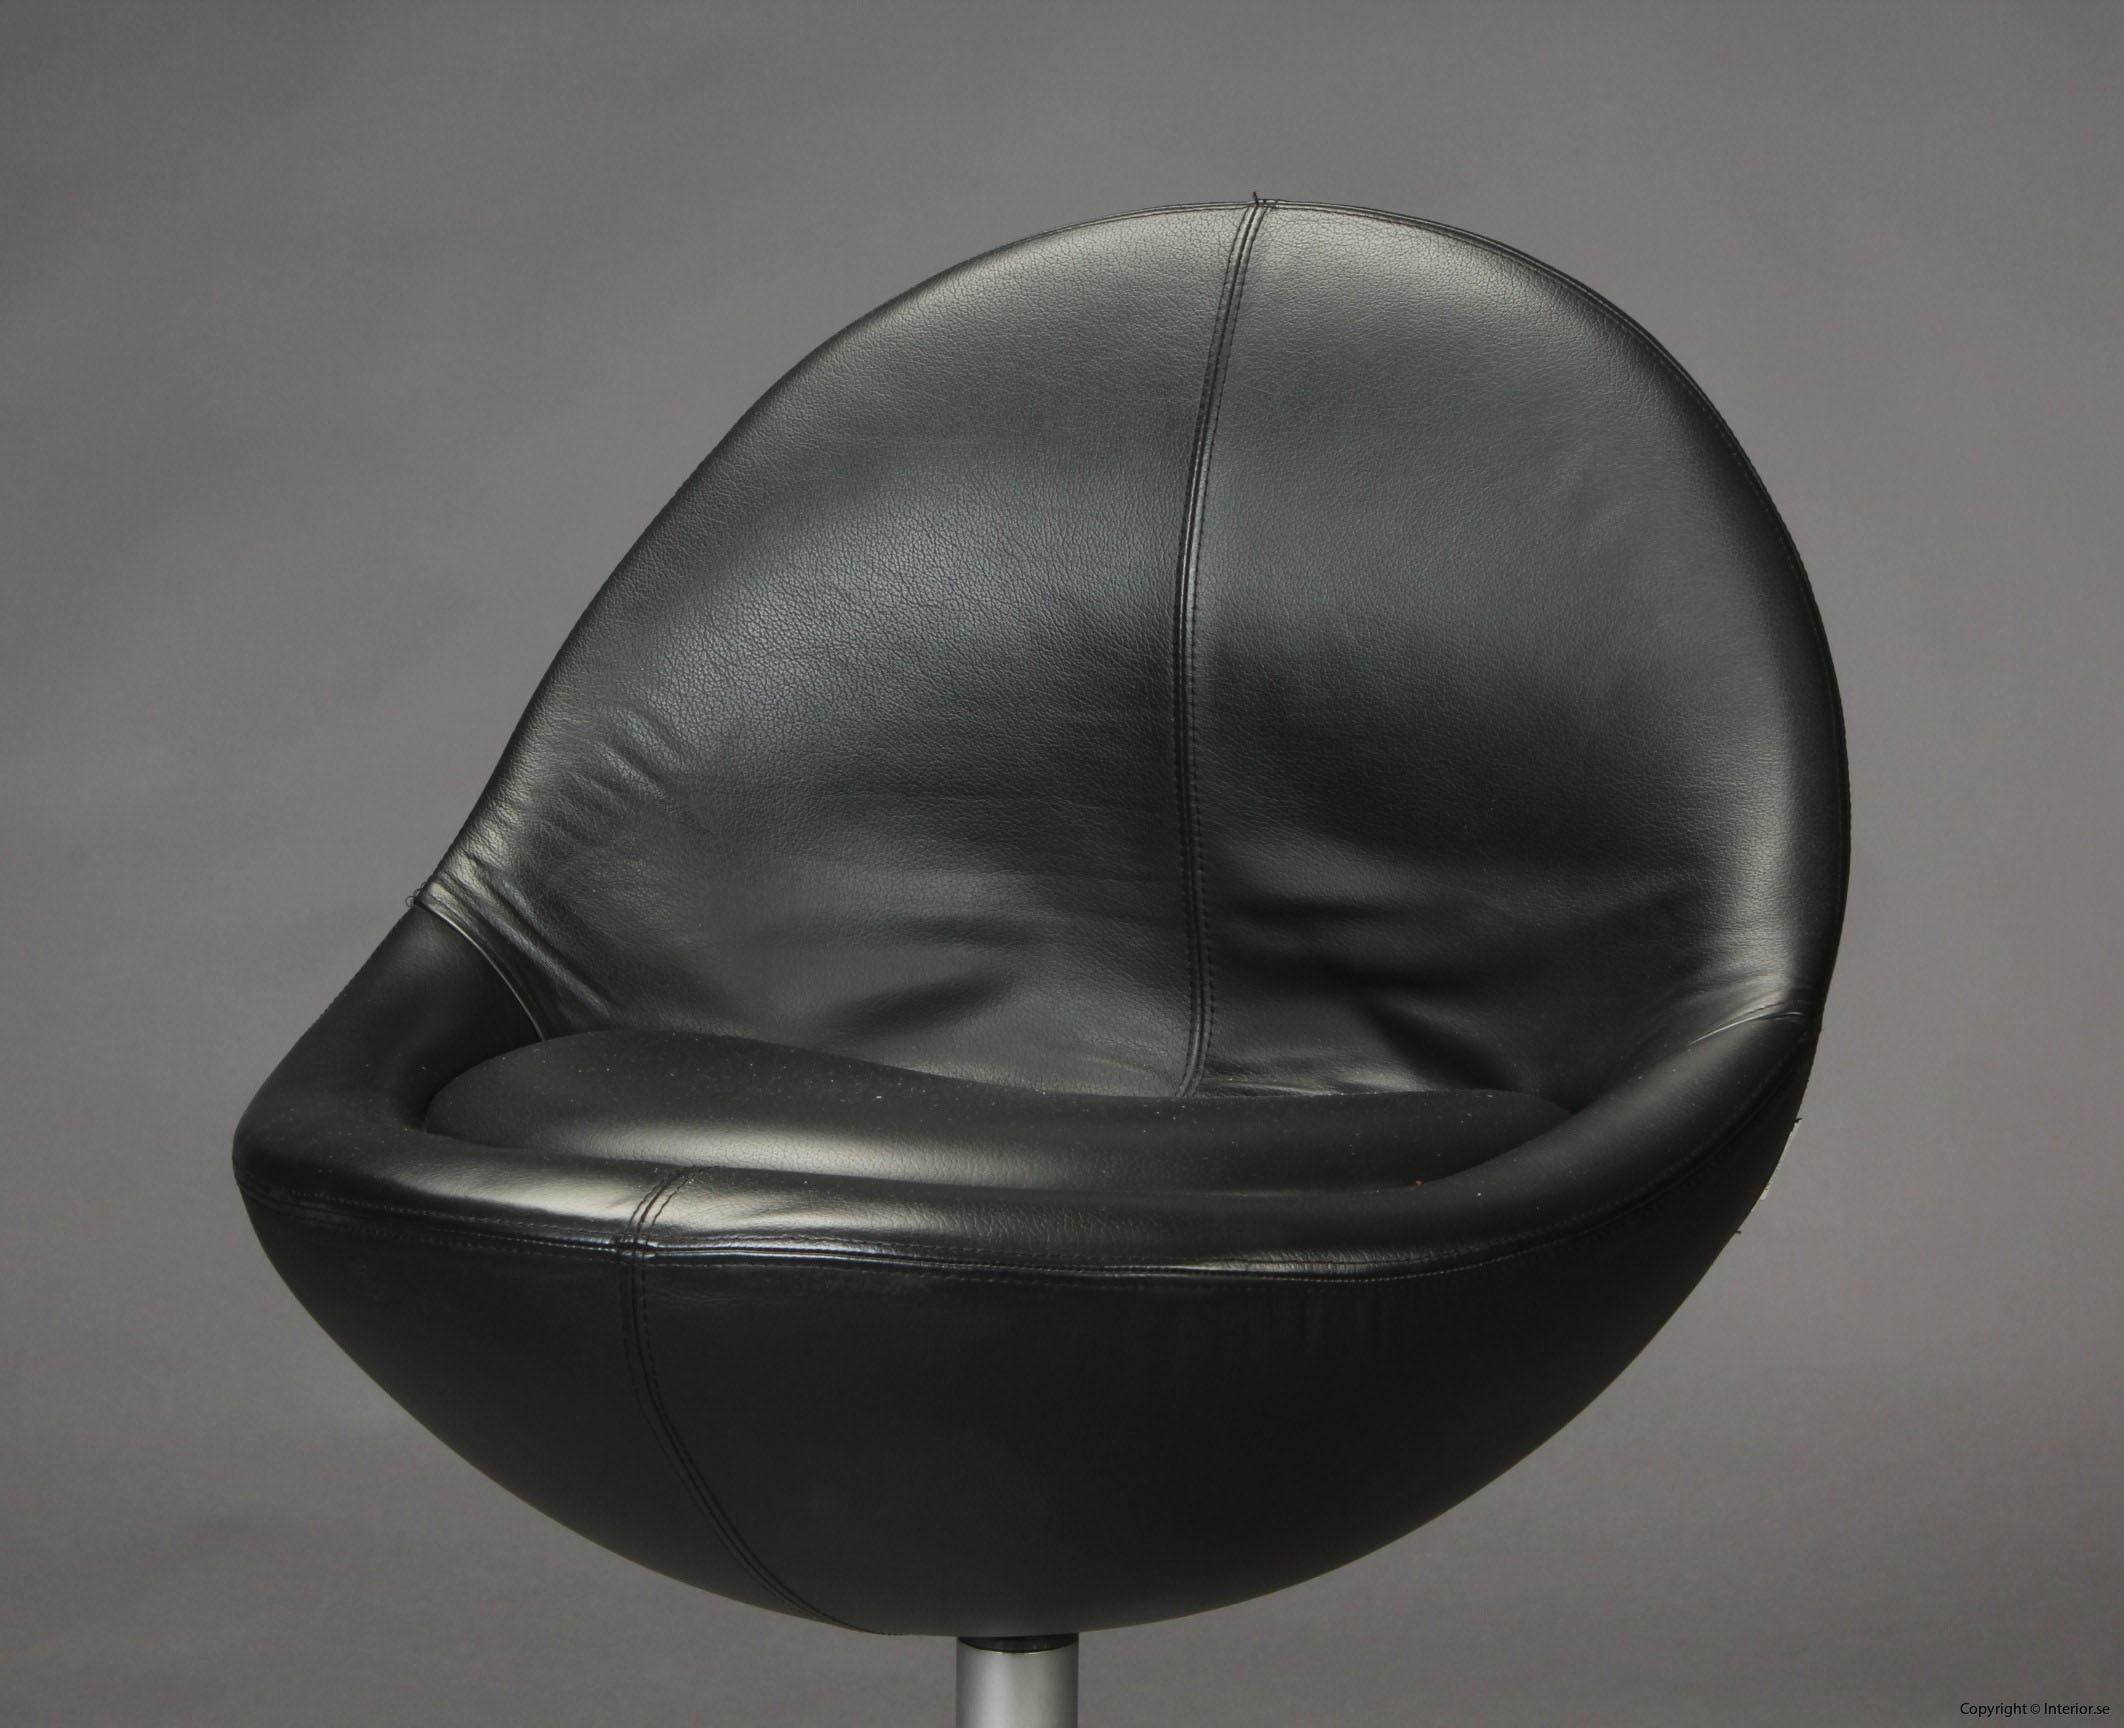 1 Johanson Design venus barstol (5)